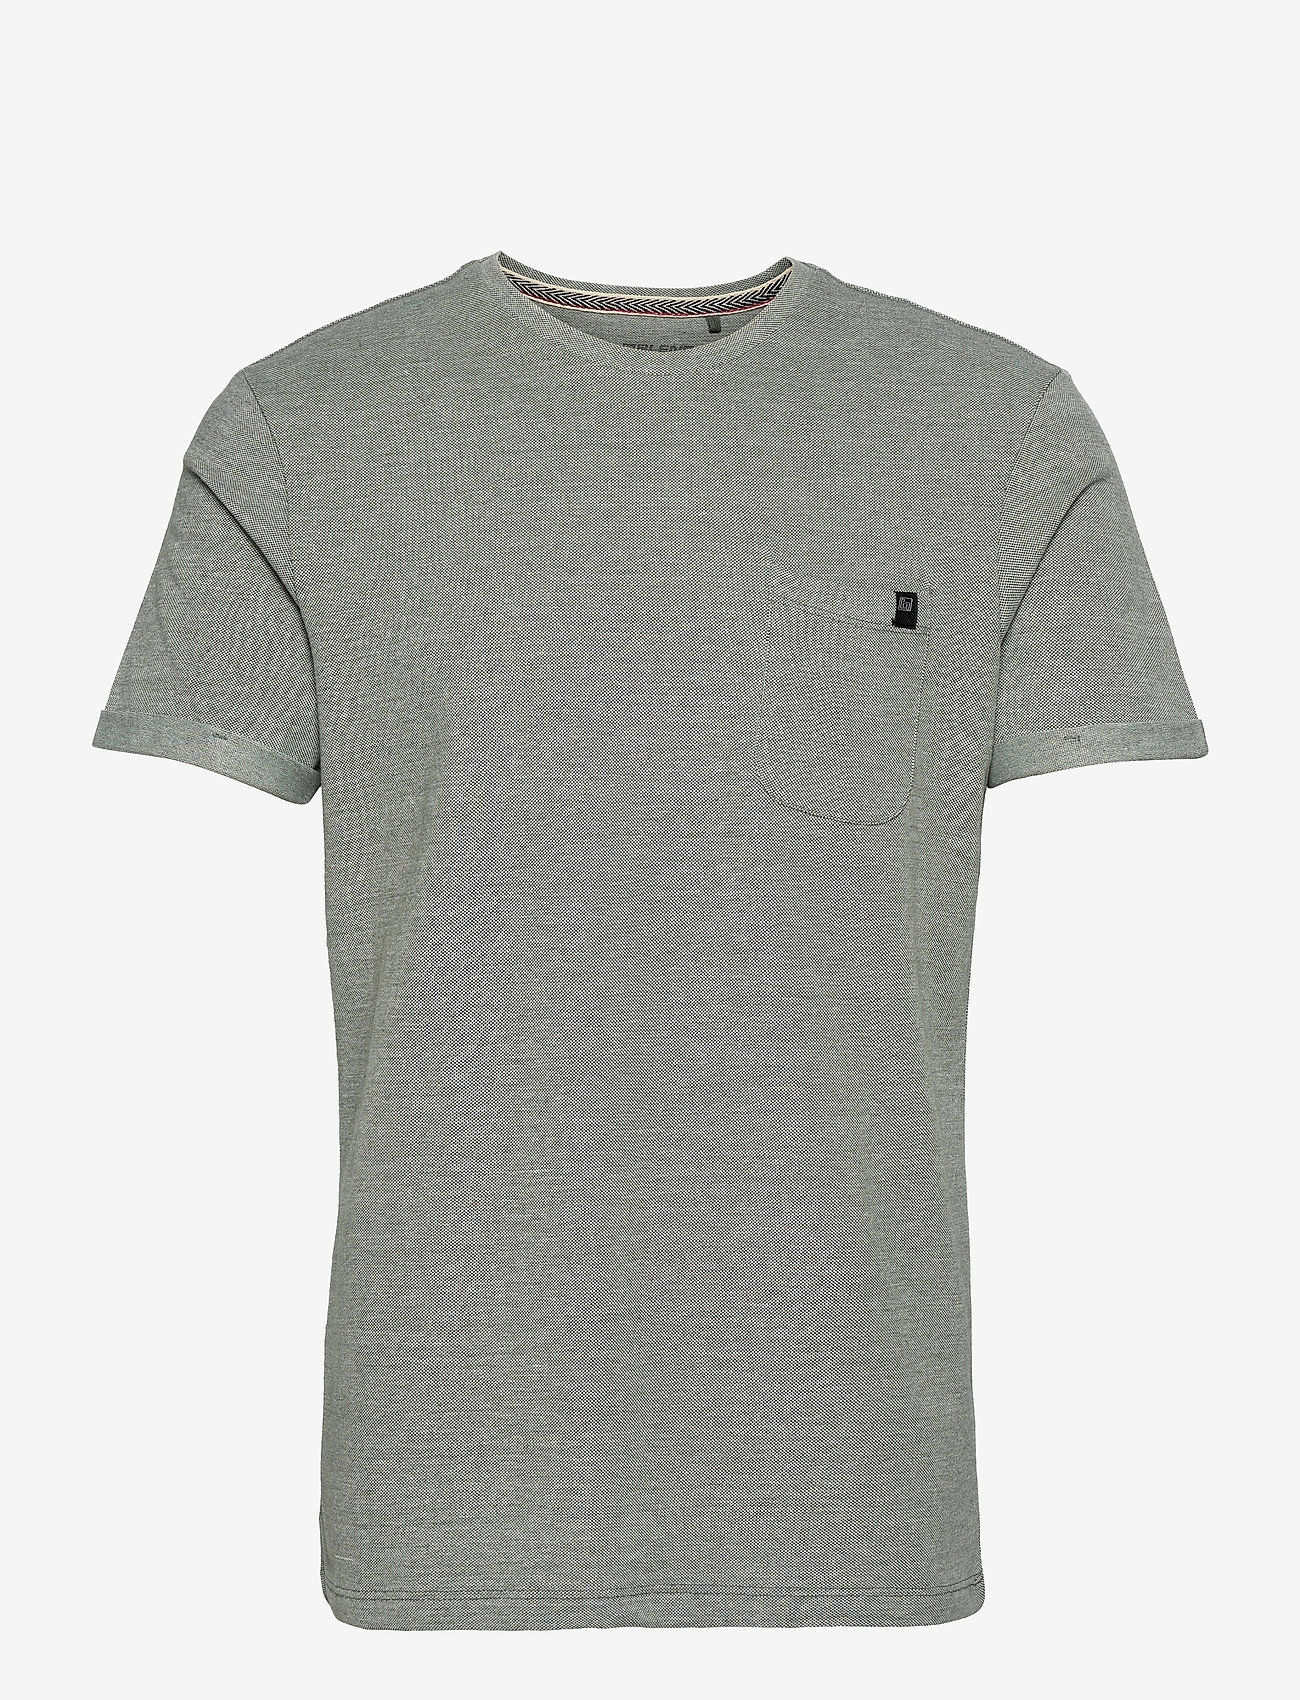 Blend - Tee - basic t-shirts - thyme - 0